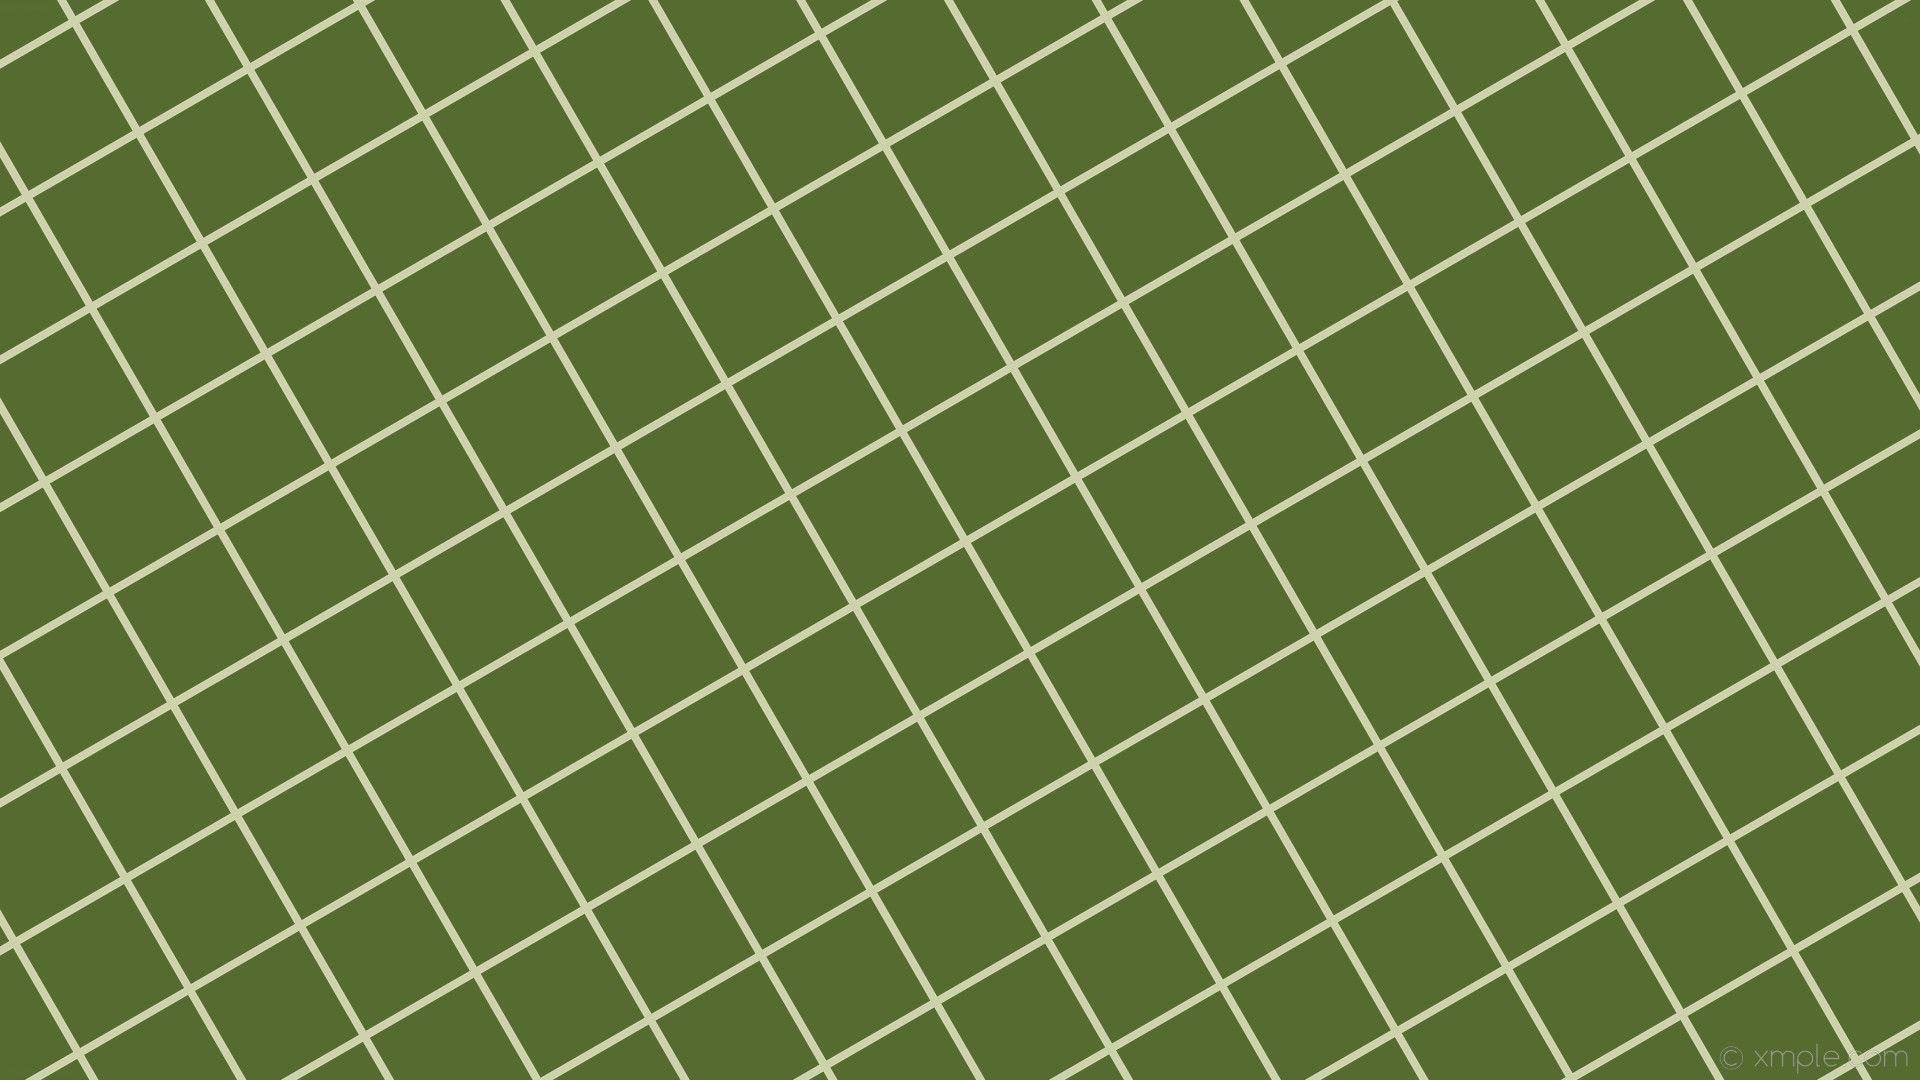 Olive Greenaesthetic Desktop Wallpapers   Top Olive 1920x1080